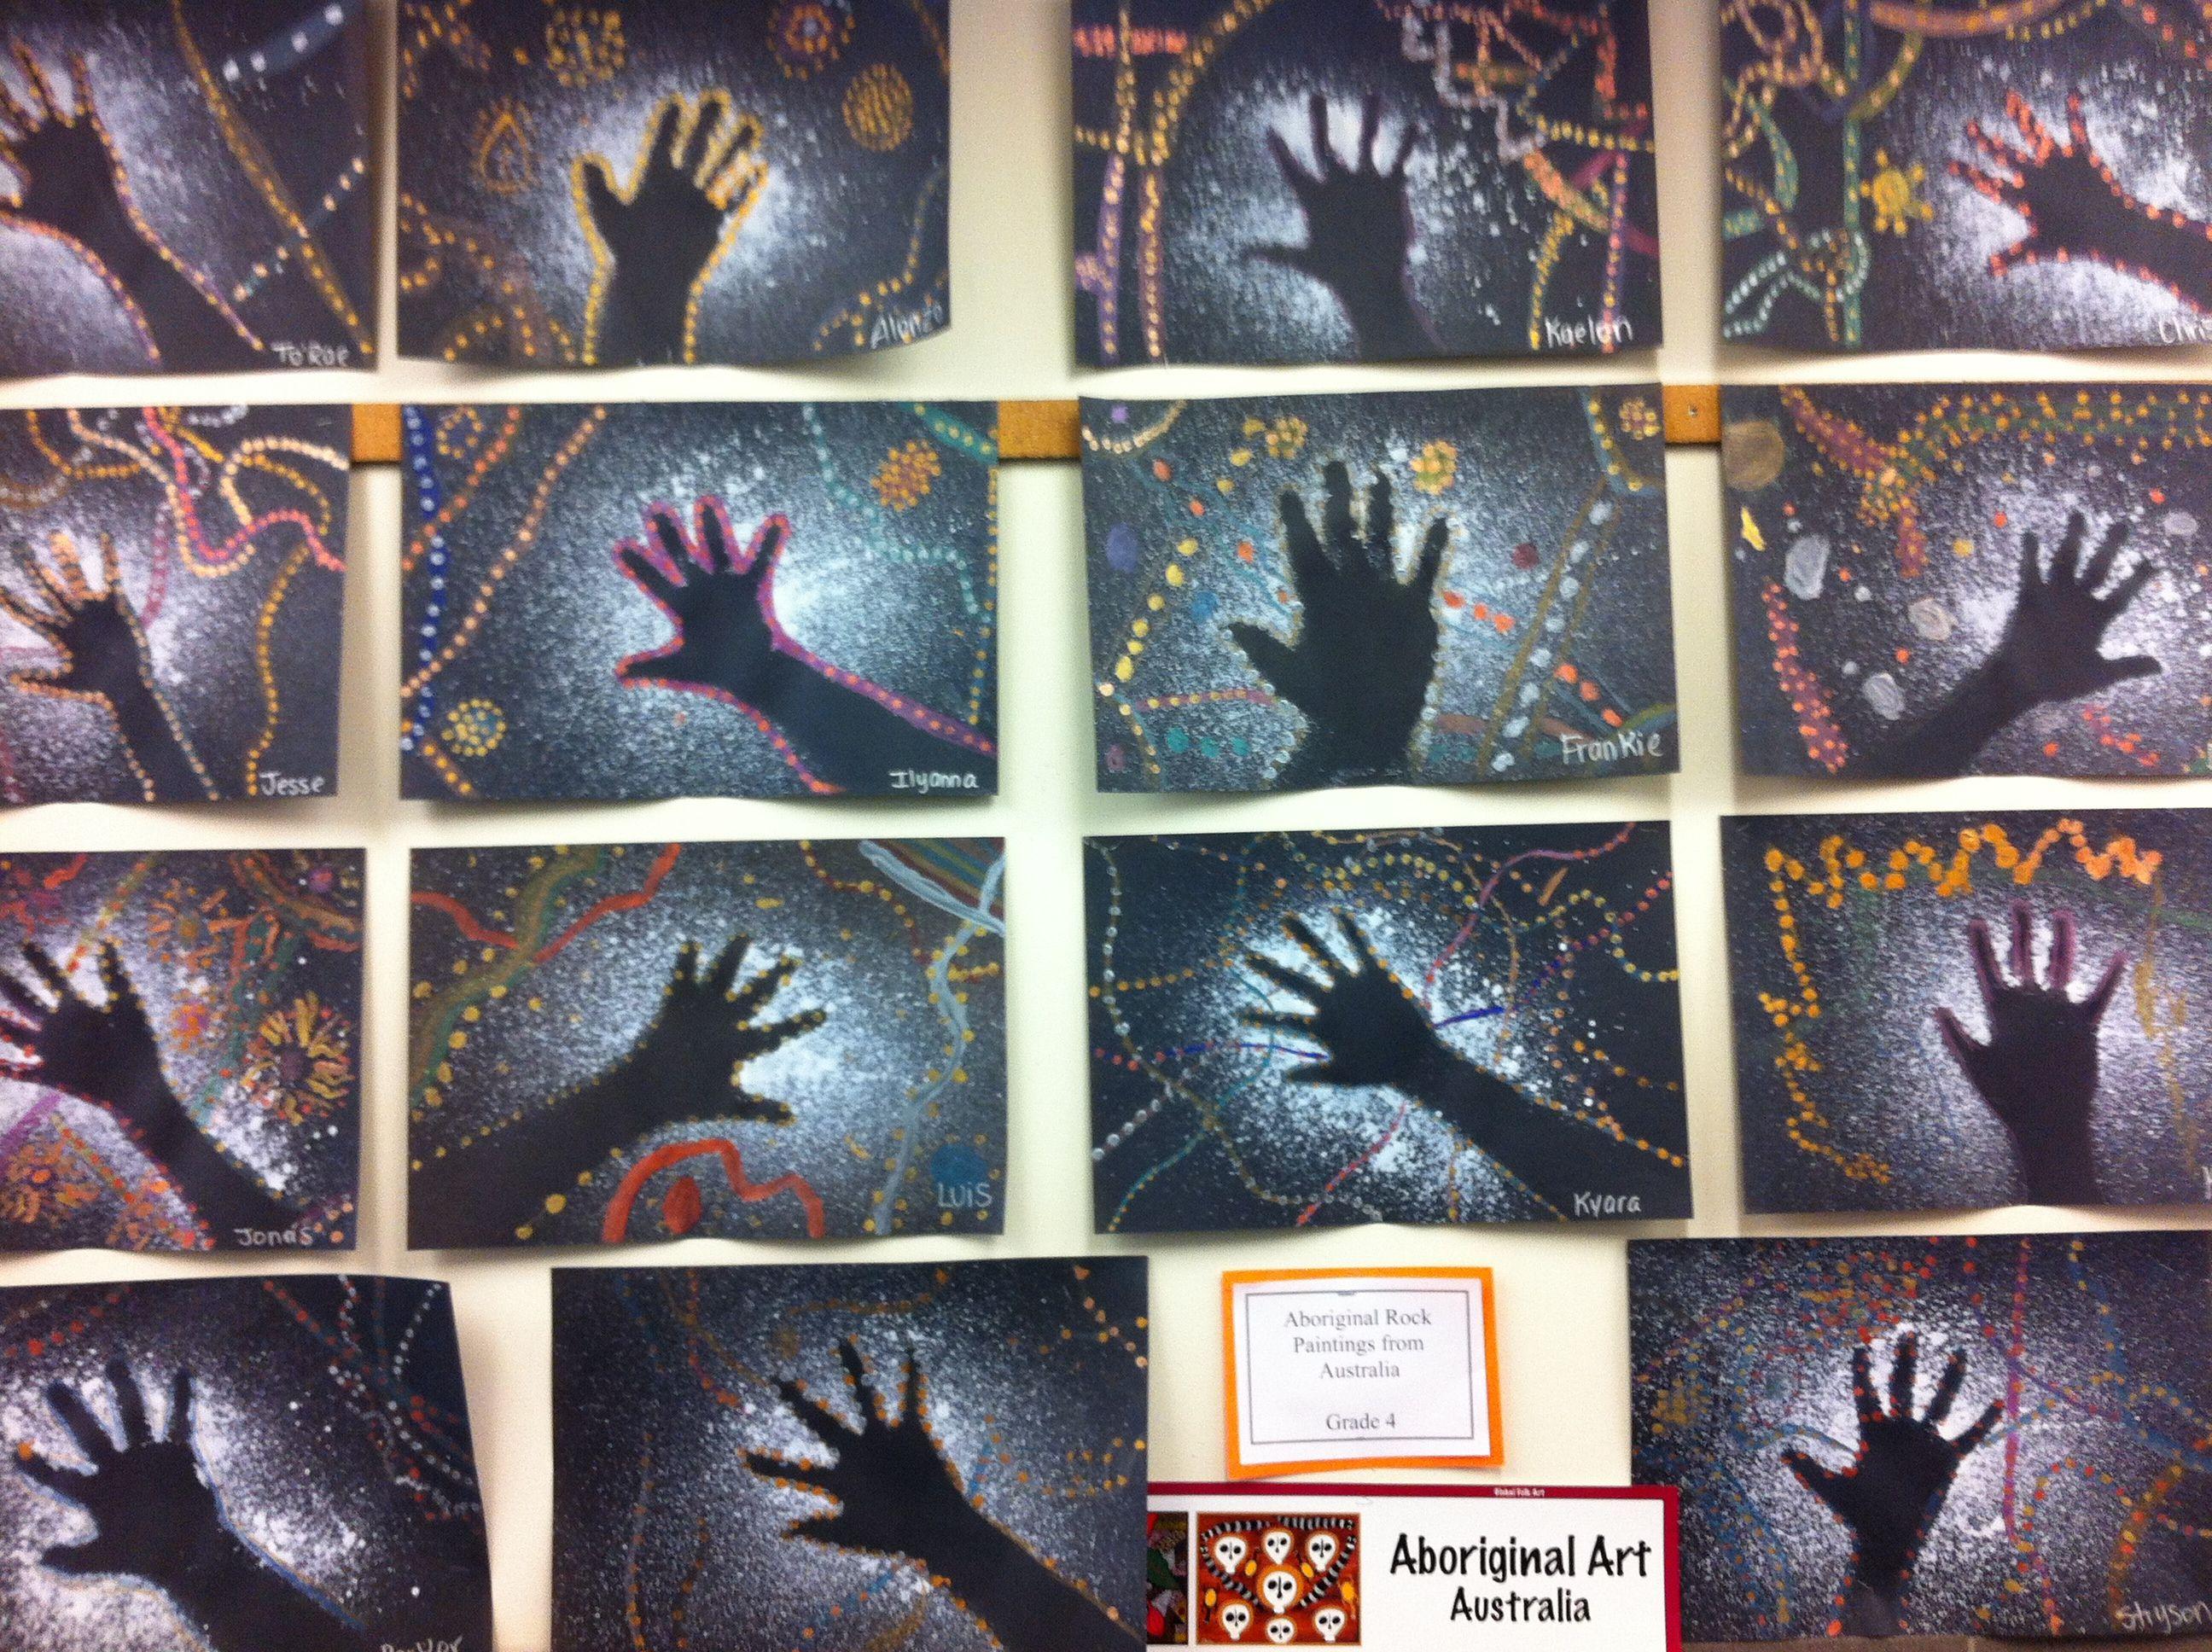 Aboriginal Rock Art Multicultural Projects Aboriginal Art For